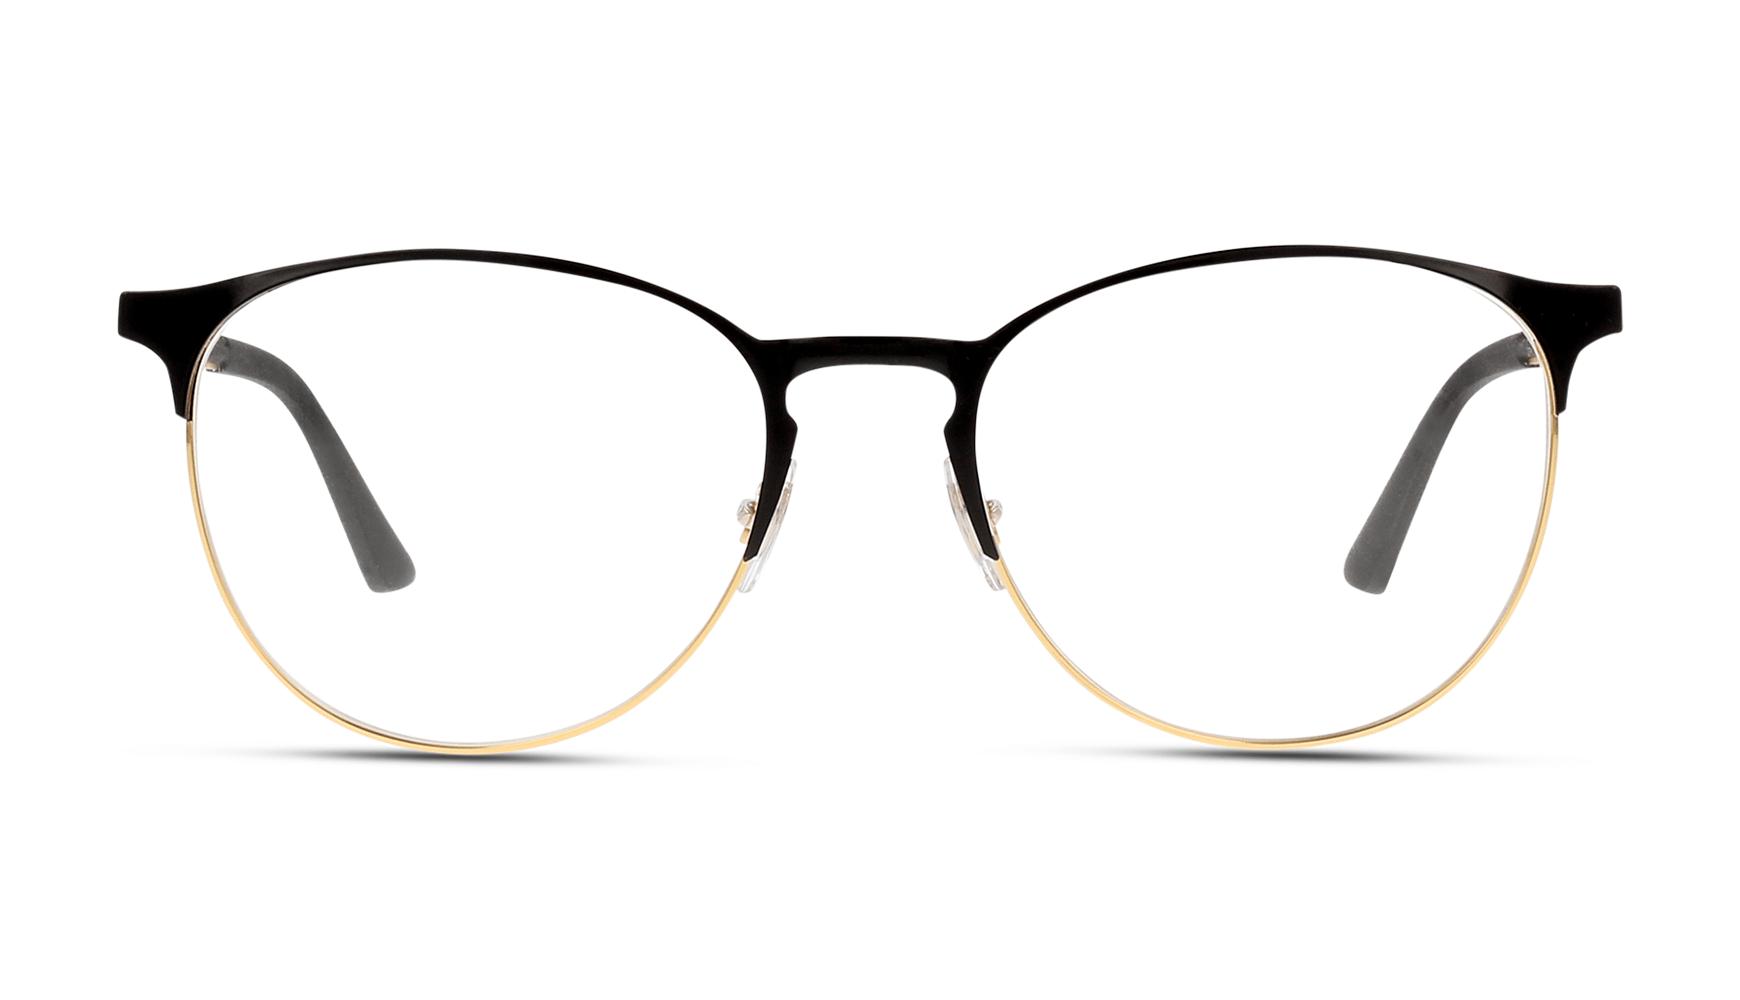 Oculos METAL